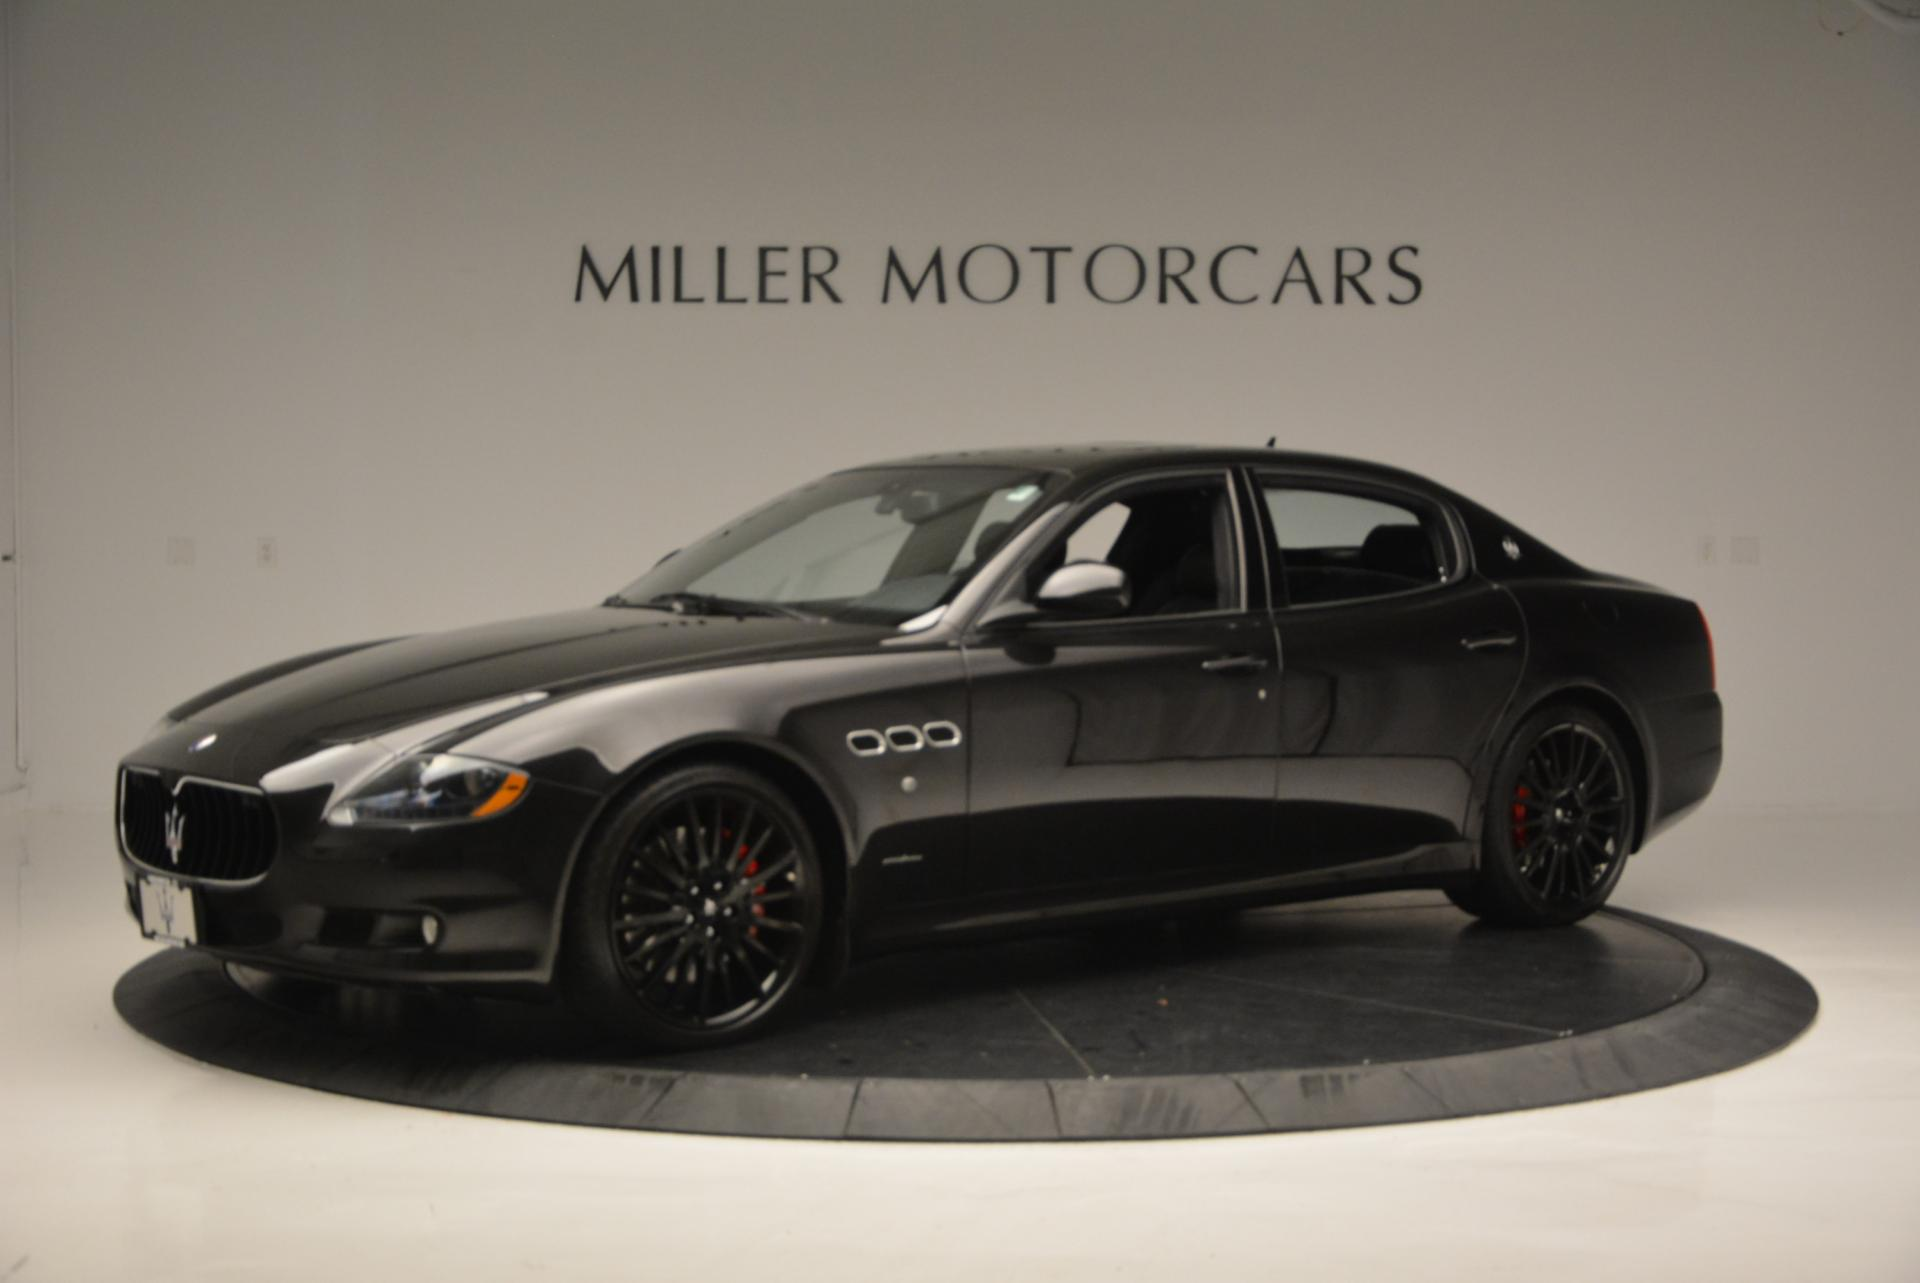 https://www.millermotorcars.com/galleria_images/531/531_p2_l.jpg